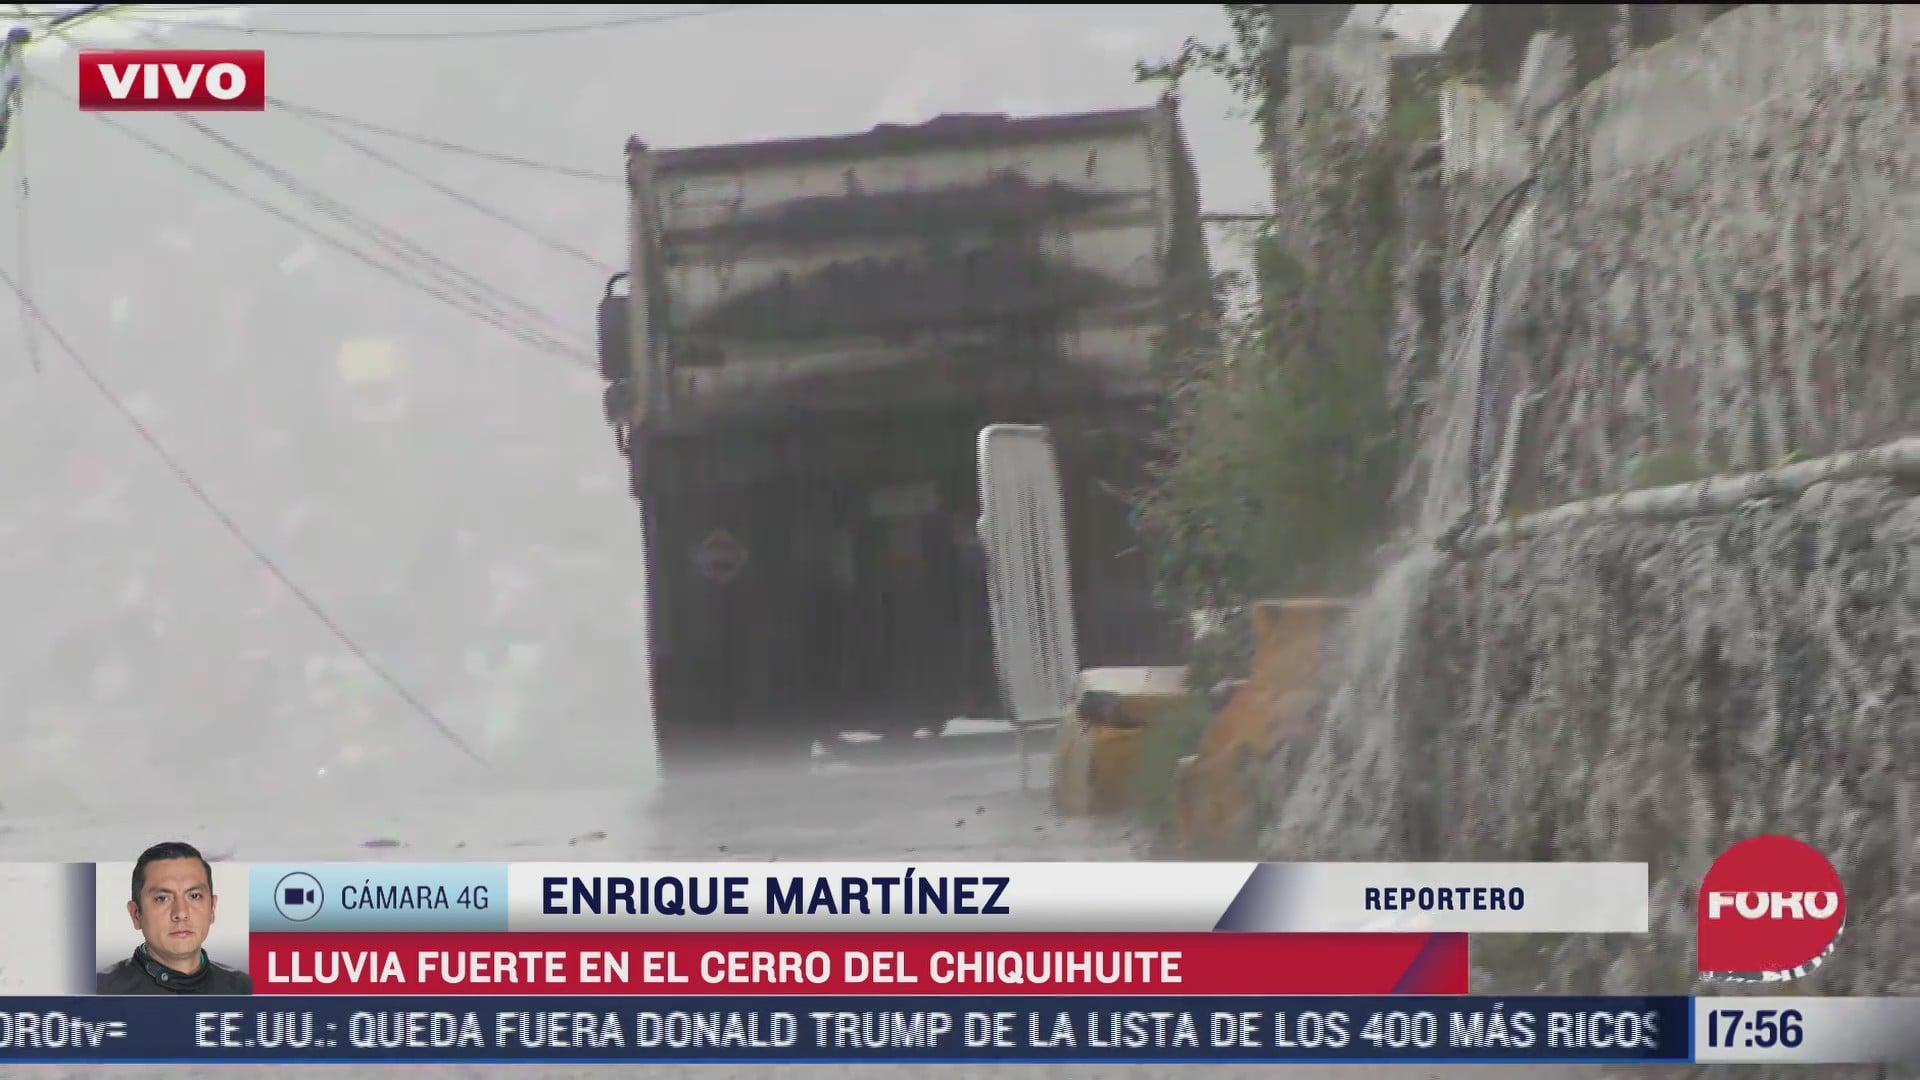 reportan lluvias intensas en zona del cerro del chiquihuite